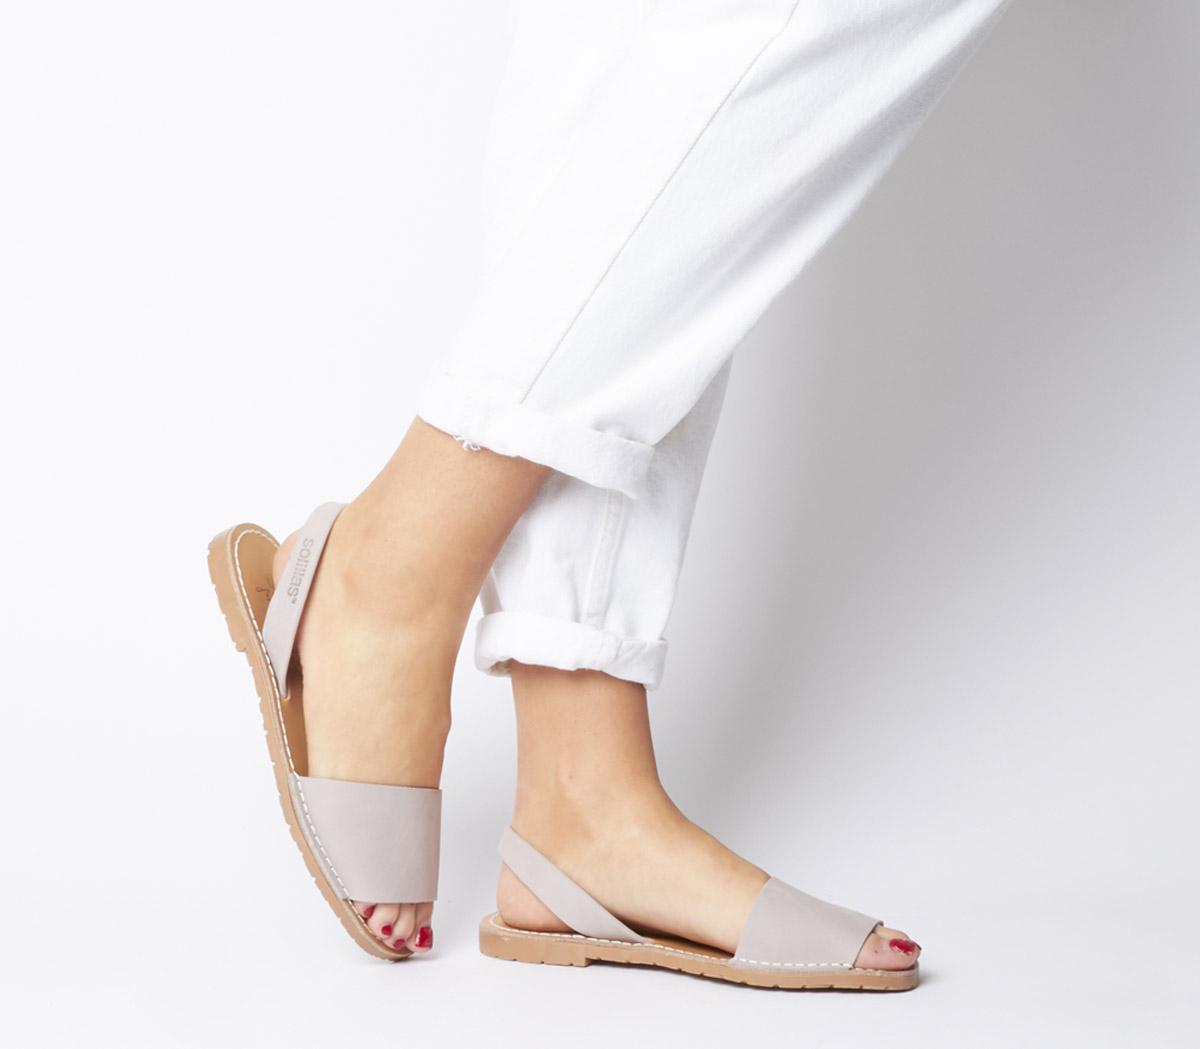 Solillas Ballerina Sandals